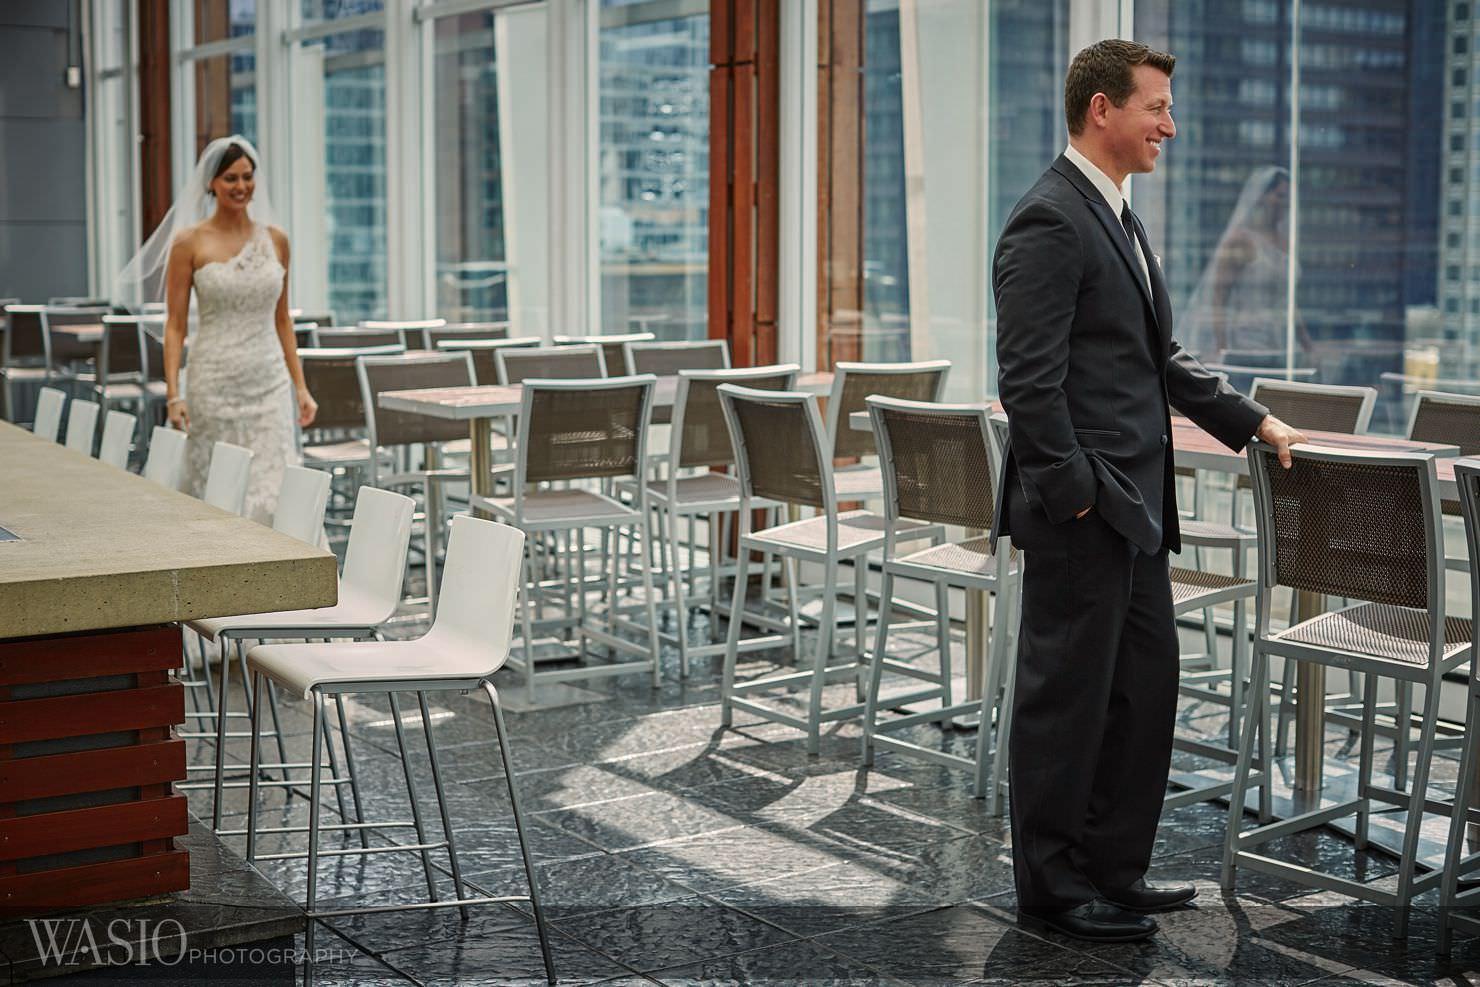 13_Venue-One-Wedding_Chicago_the-wit_3P4C1607 Venue One Wedding - Tracy & John